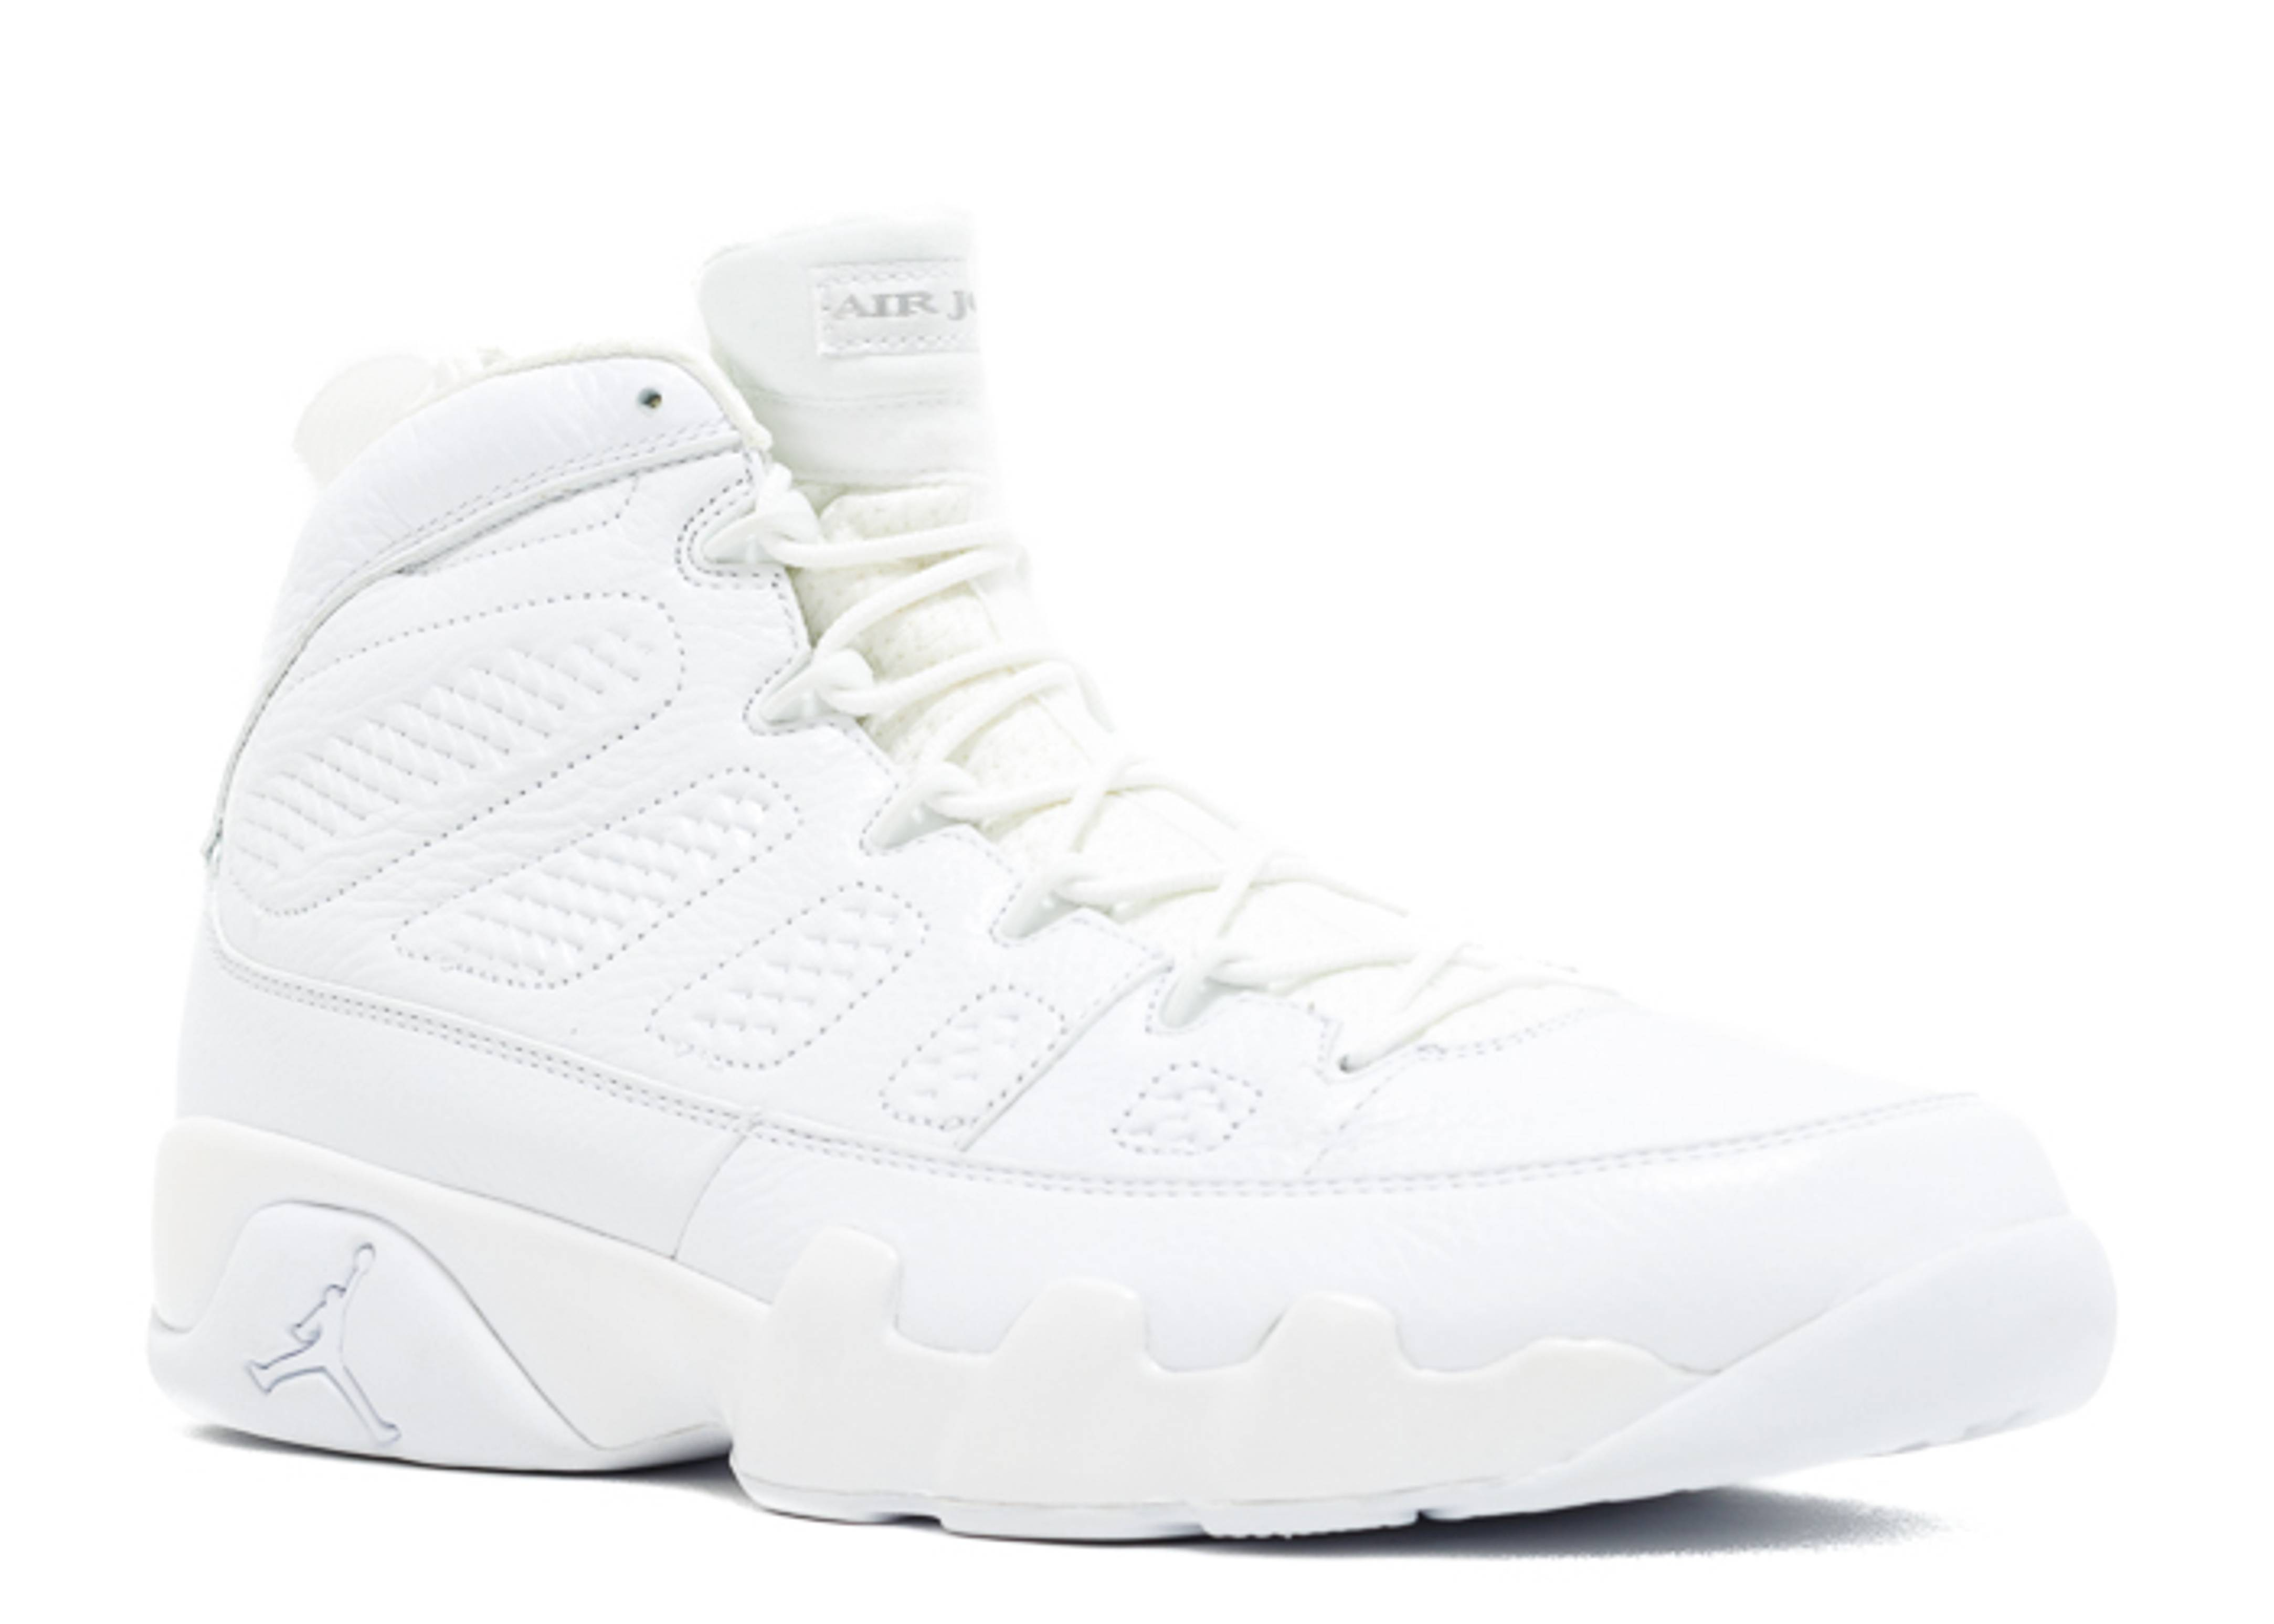 outlet store 491e4 5c809 Air Jordan 9 Retro